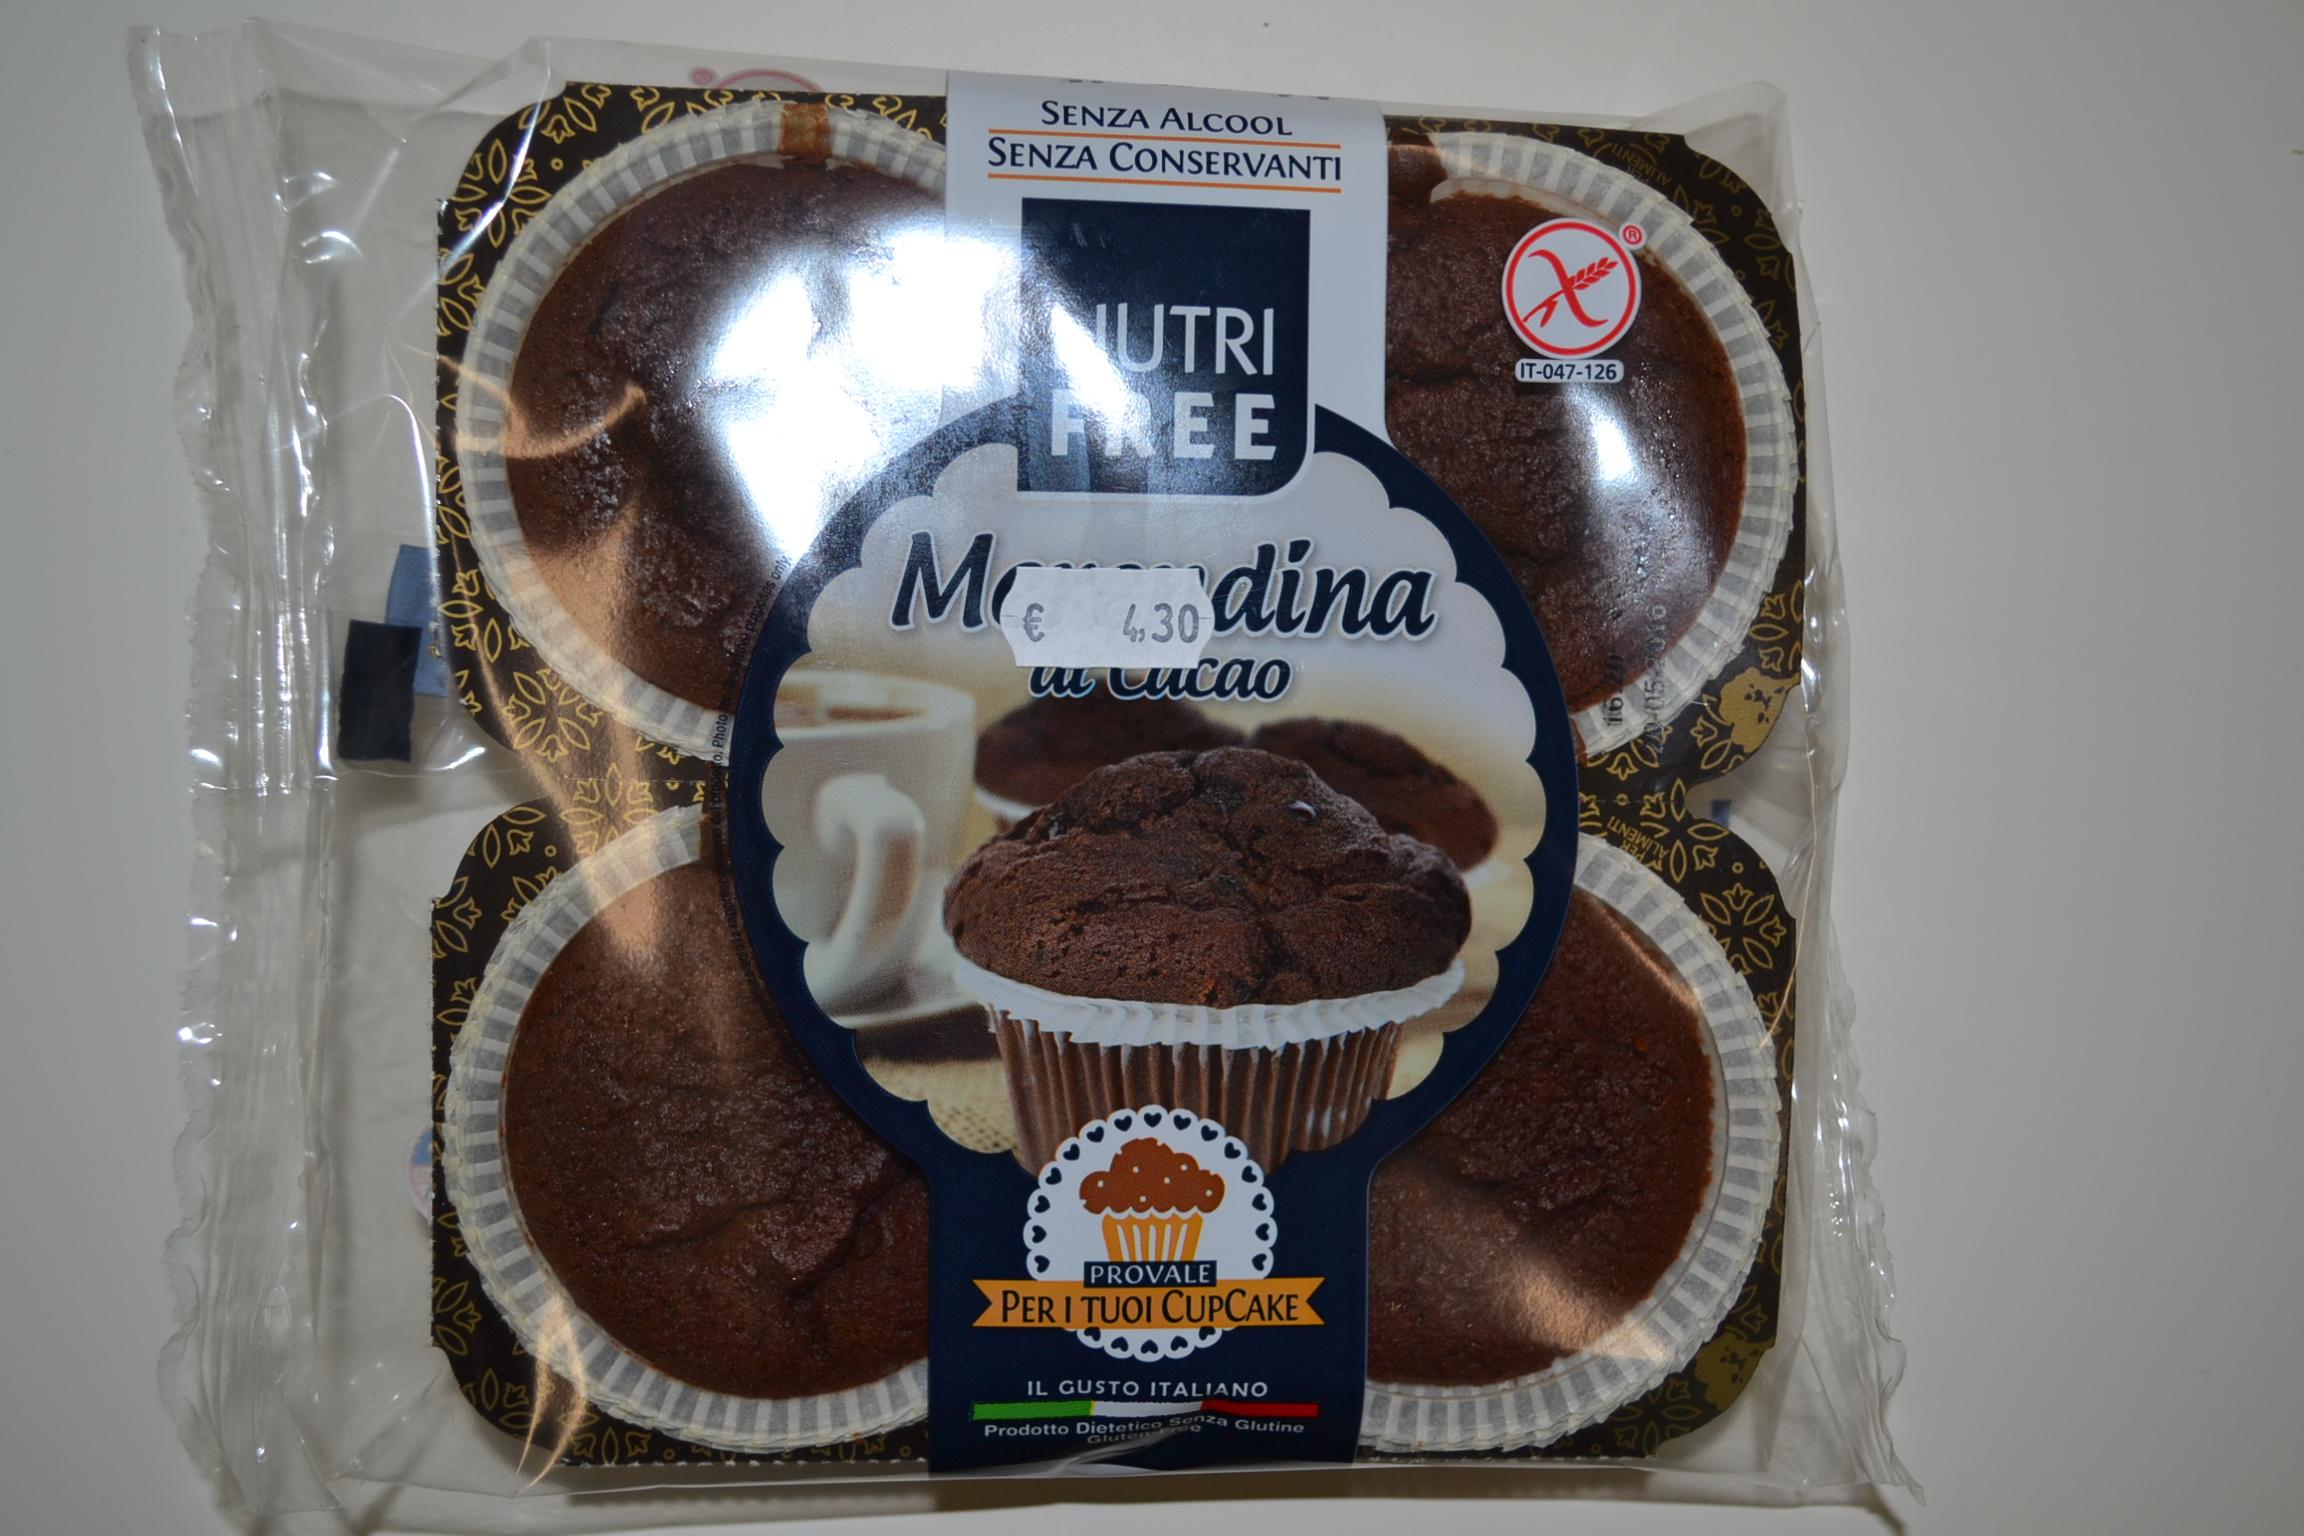 Merendina al cacao NUTRIFREE